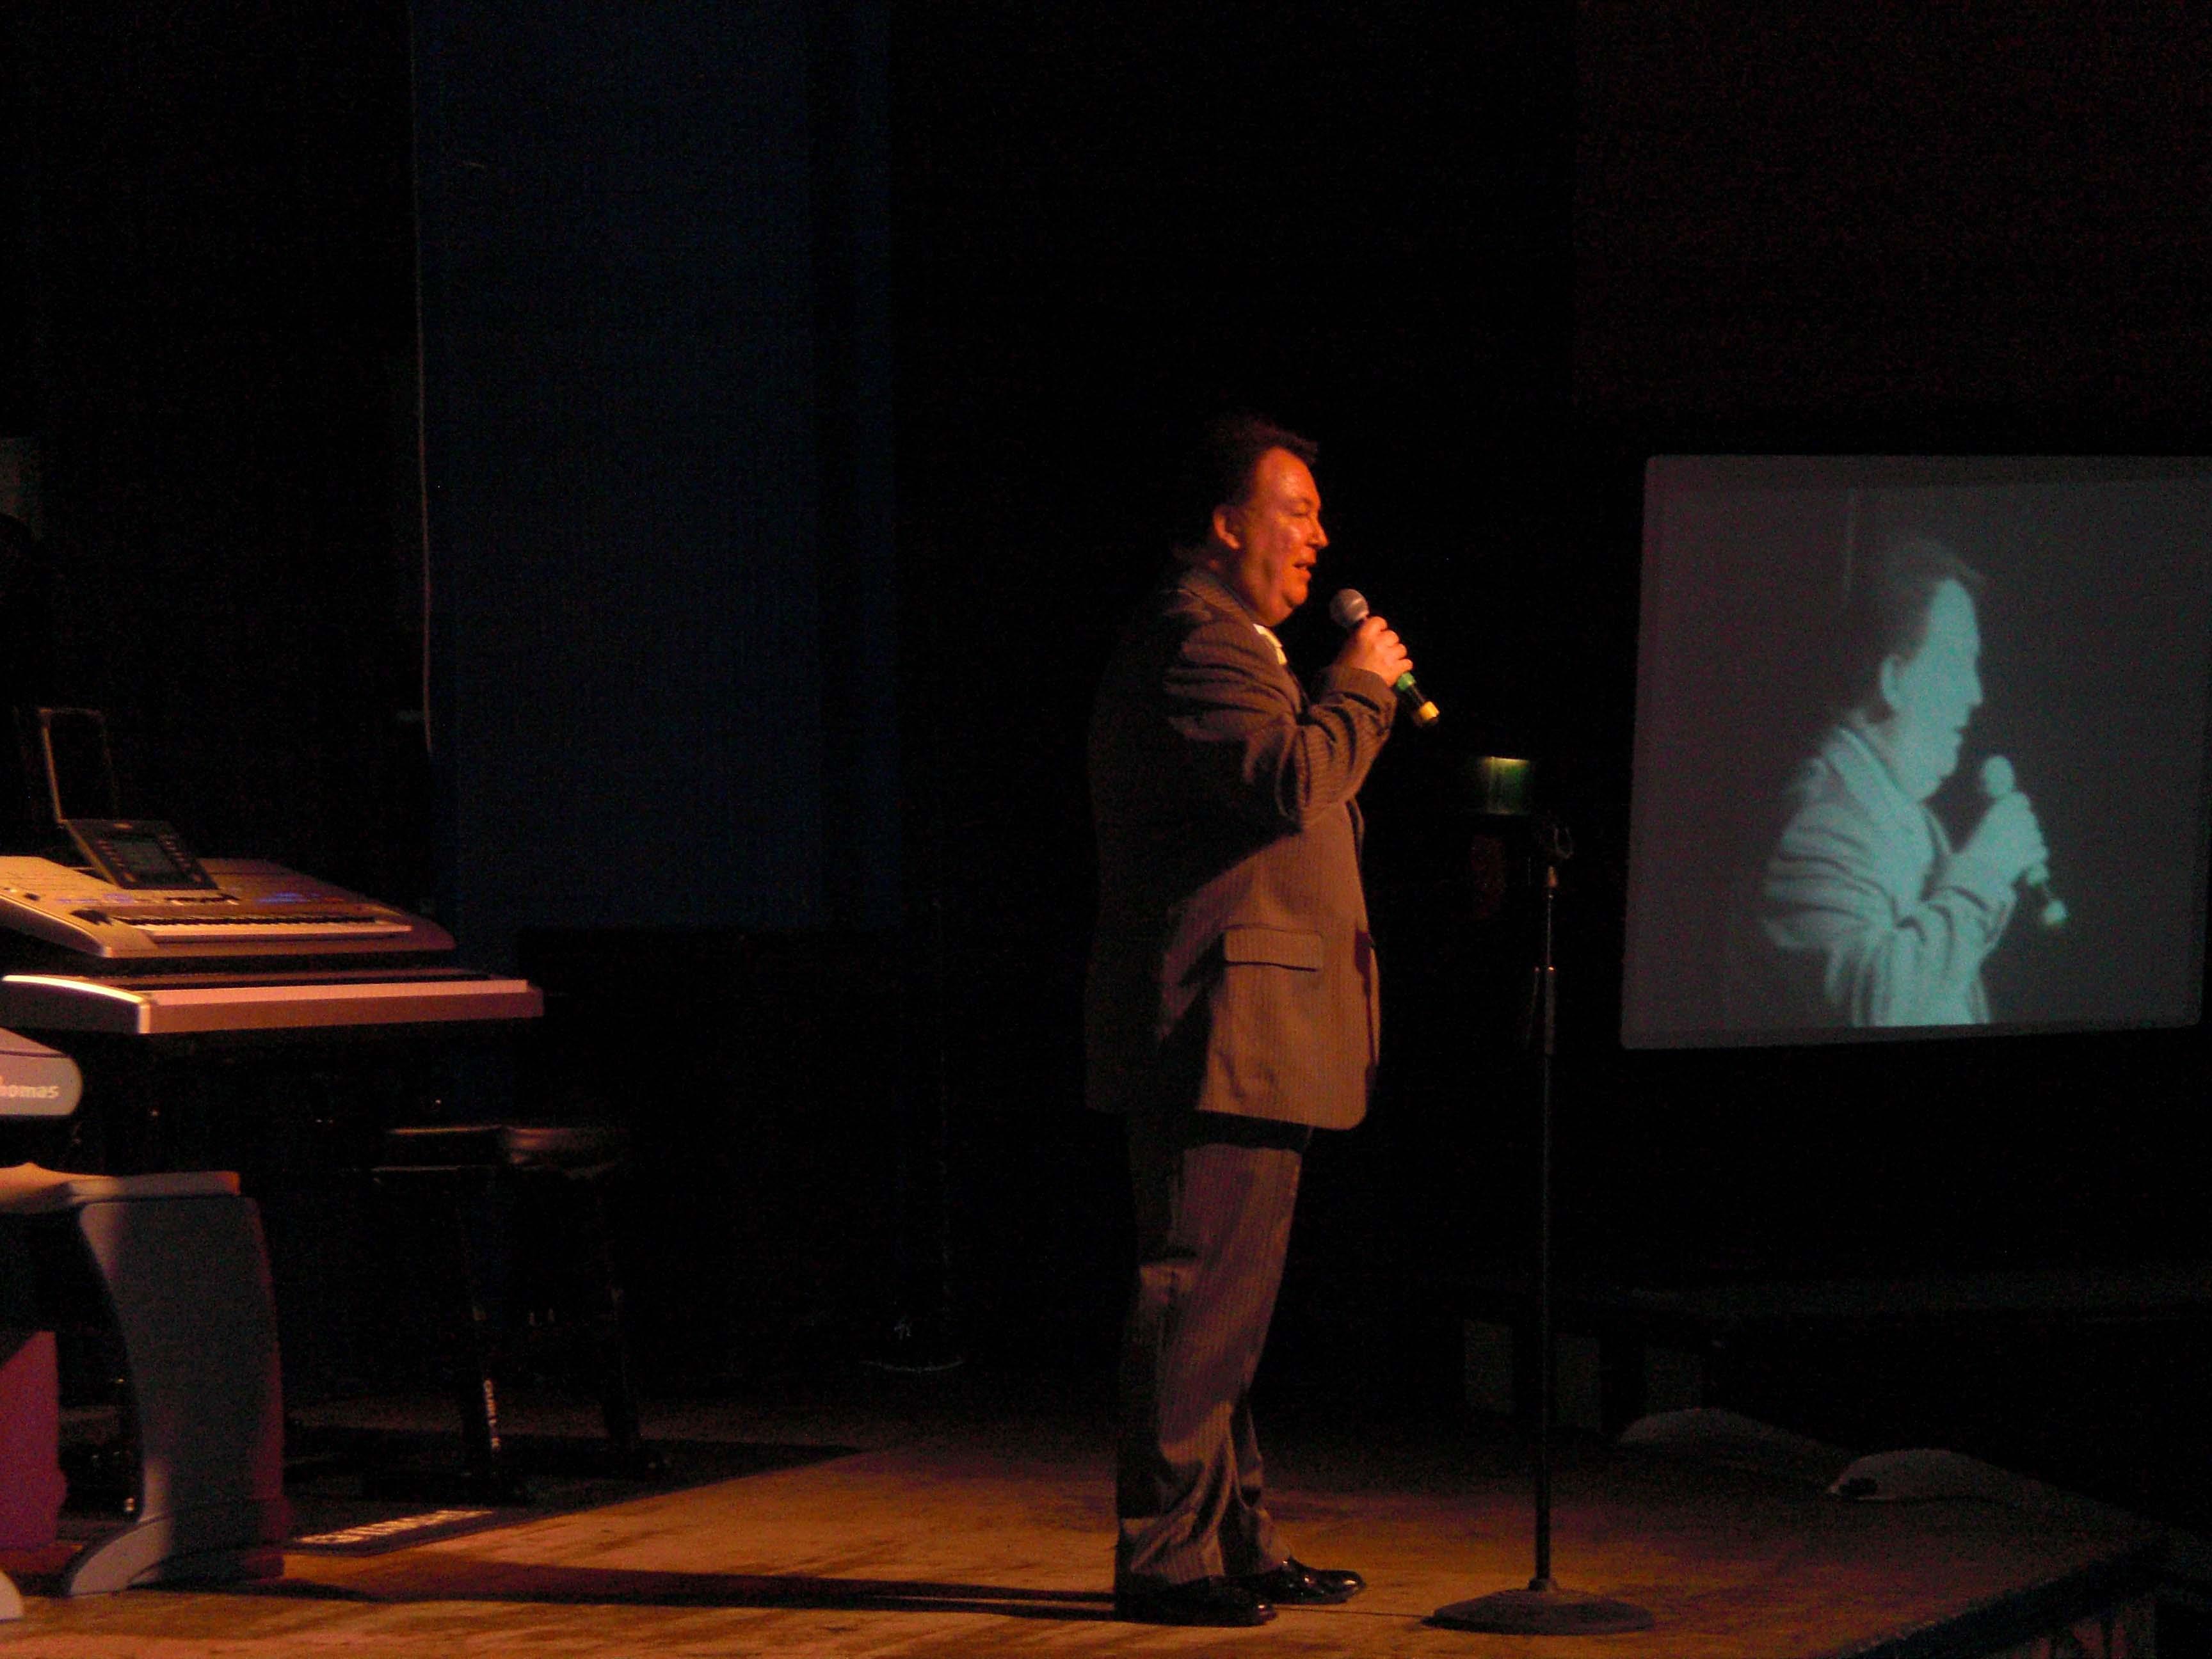 http://www.thomas-music.de/media/Pakefield_2011/CIMG0986.jpg